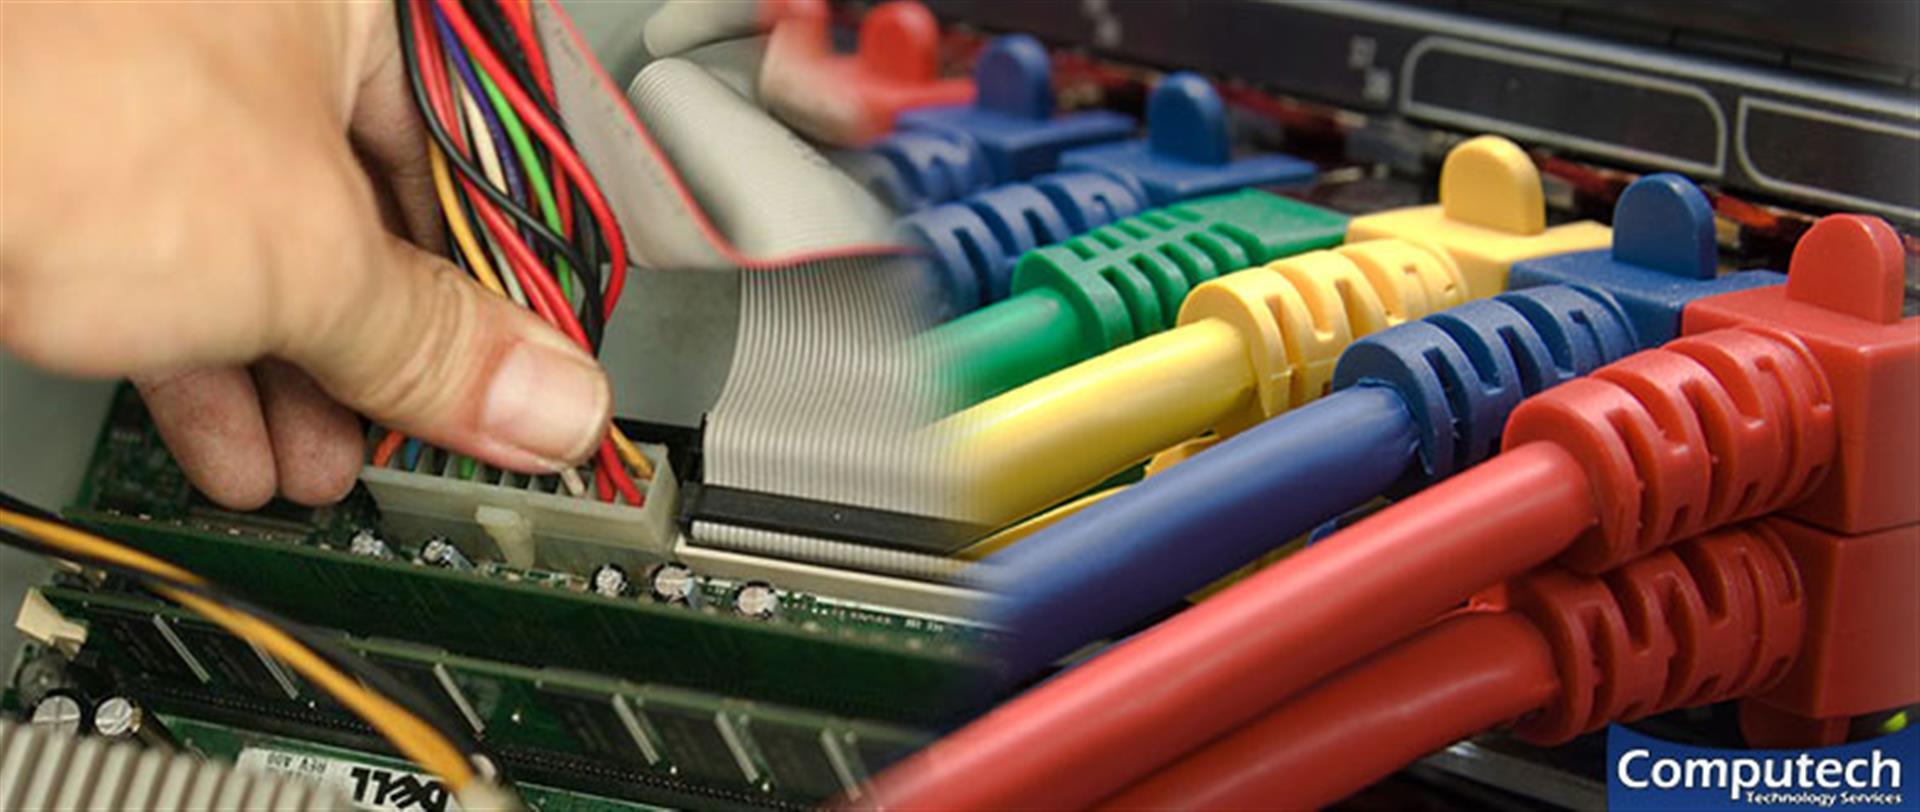 Dublin Virginia Onsite Computer PC & Printer Repair, Networking, Voice & Data Cabling Contractors